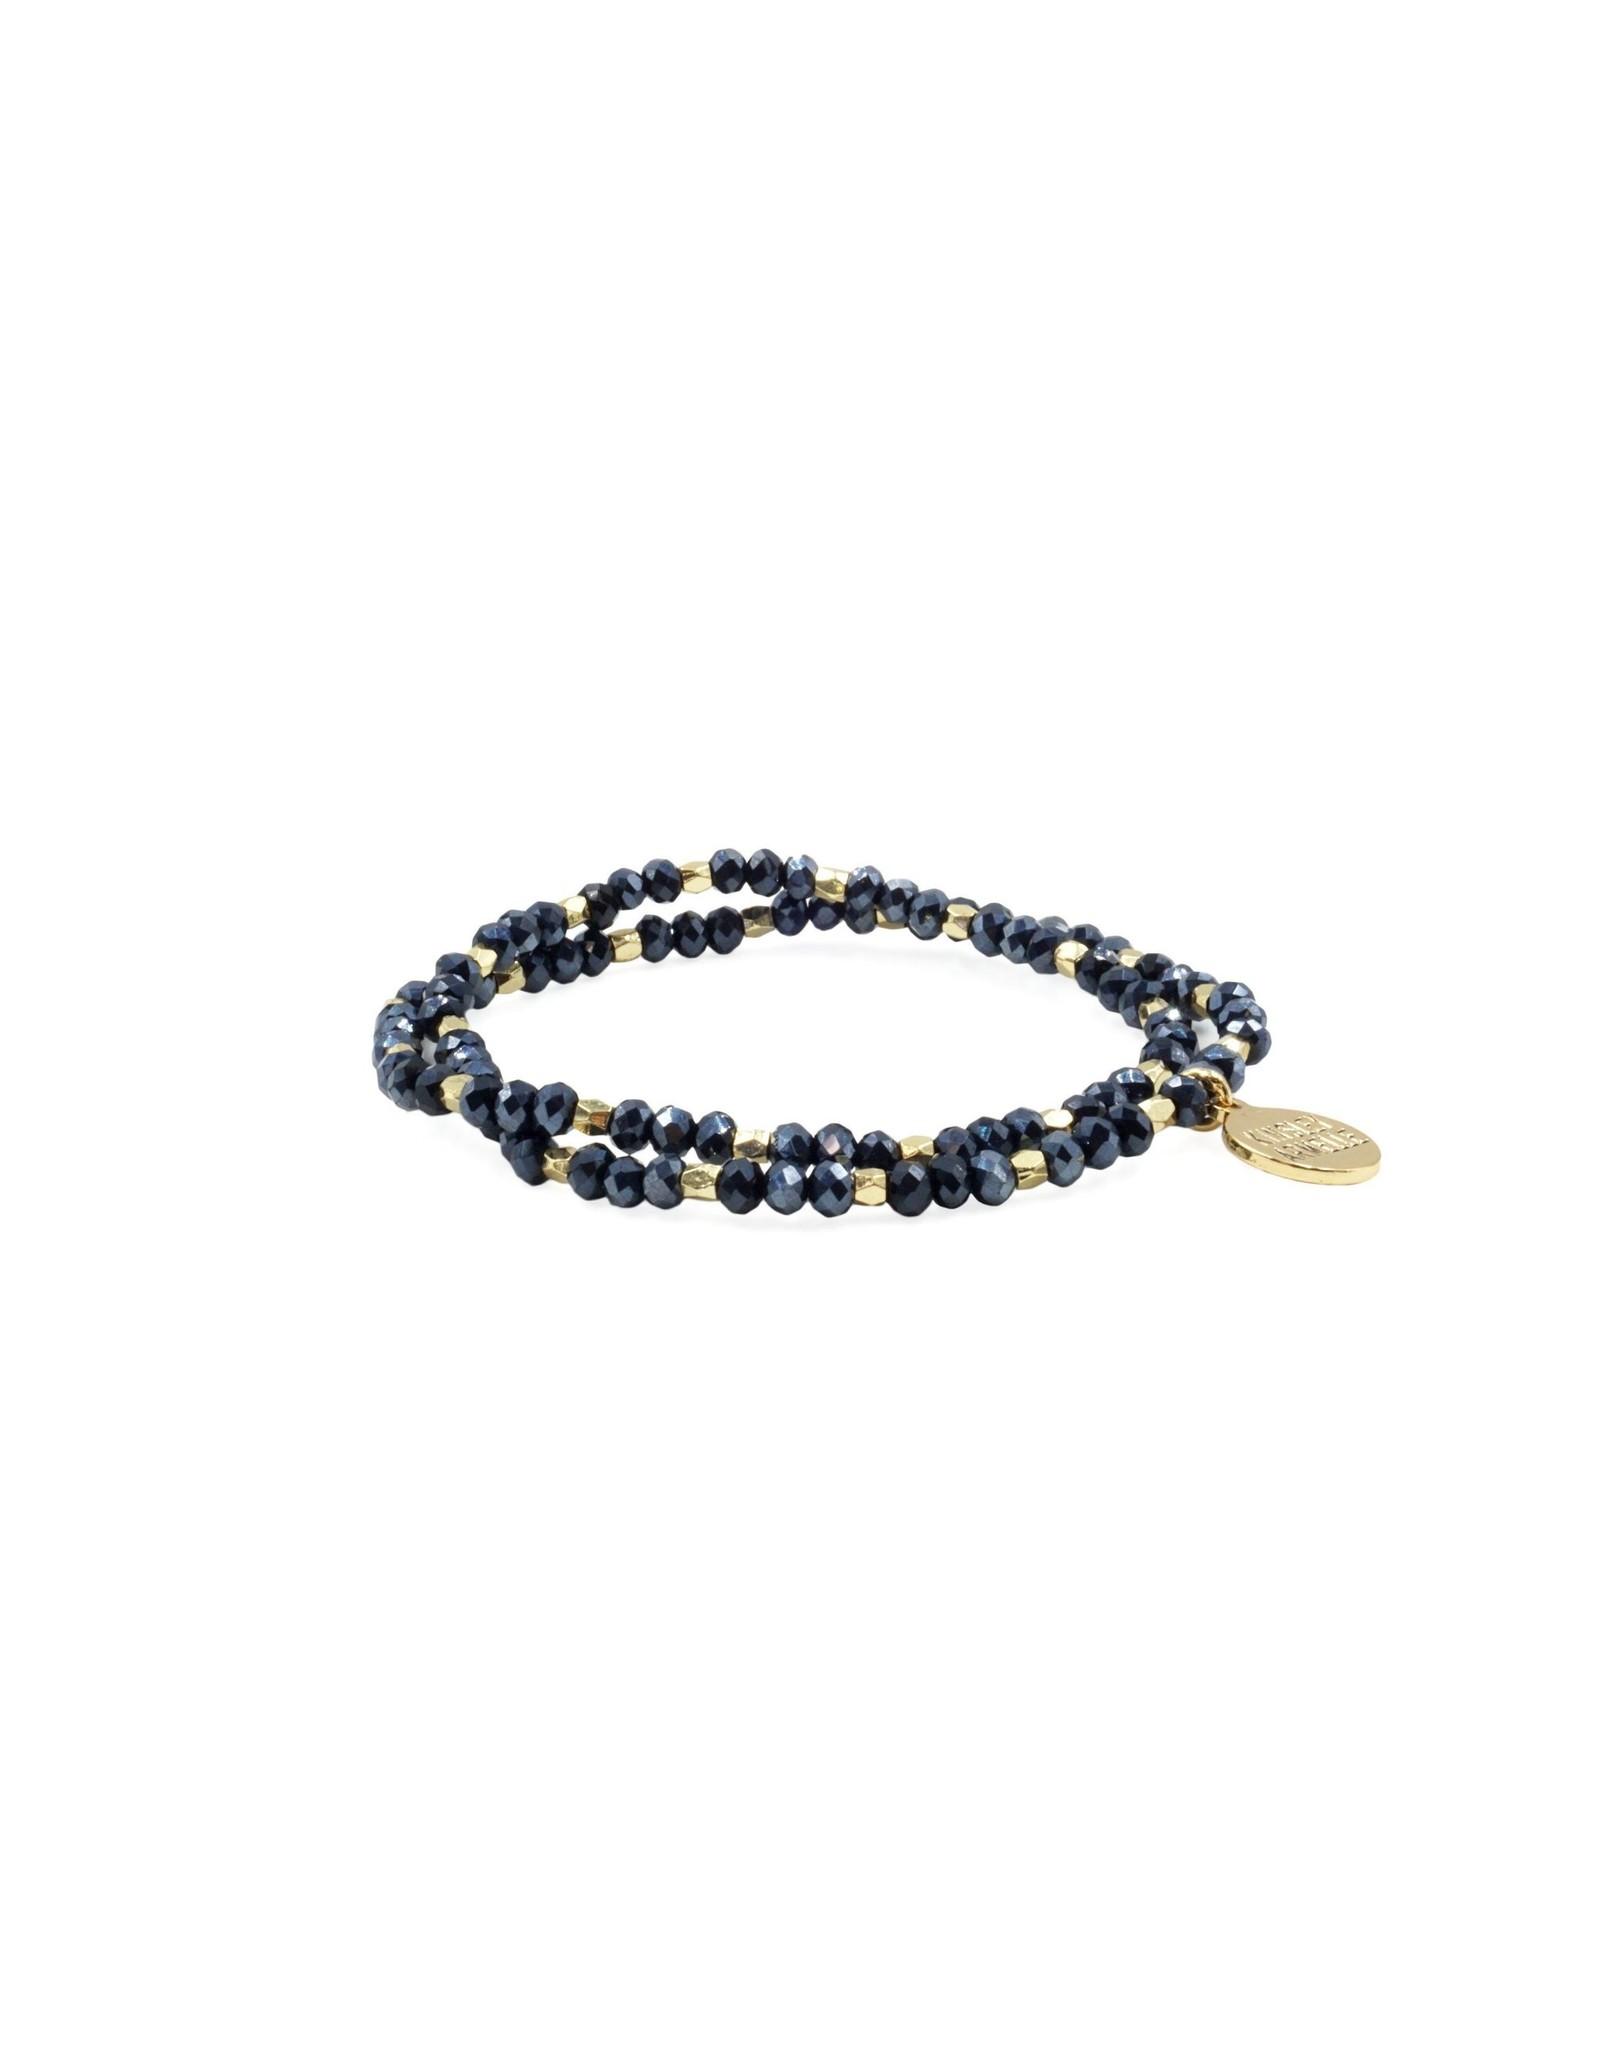 Indigo Wrap Bracelet